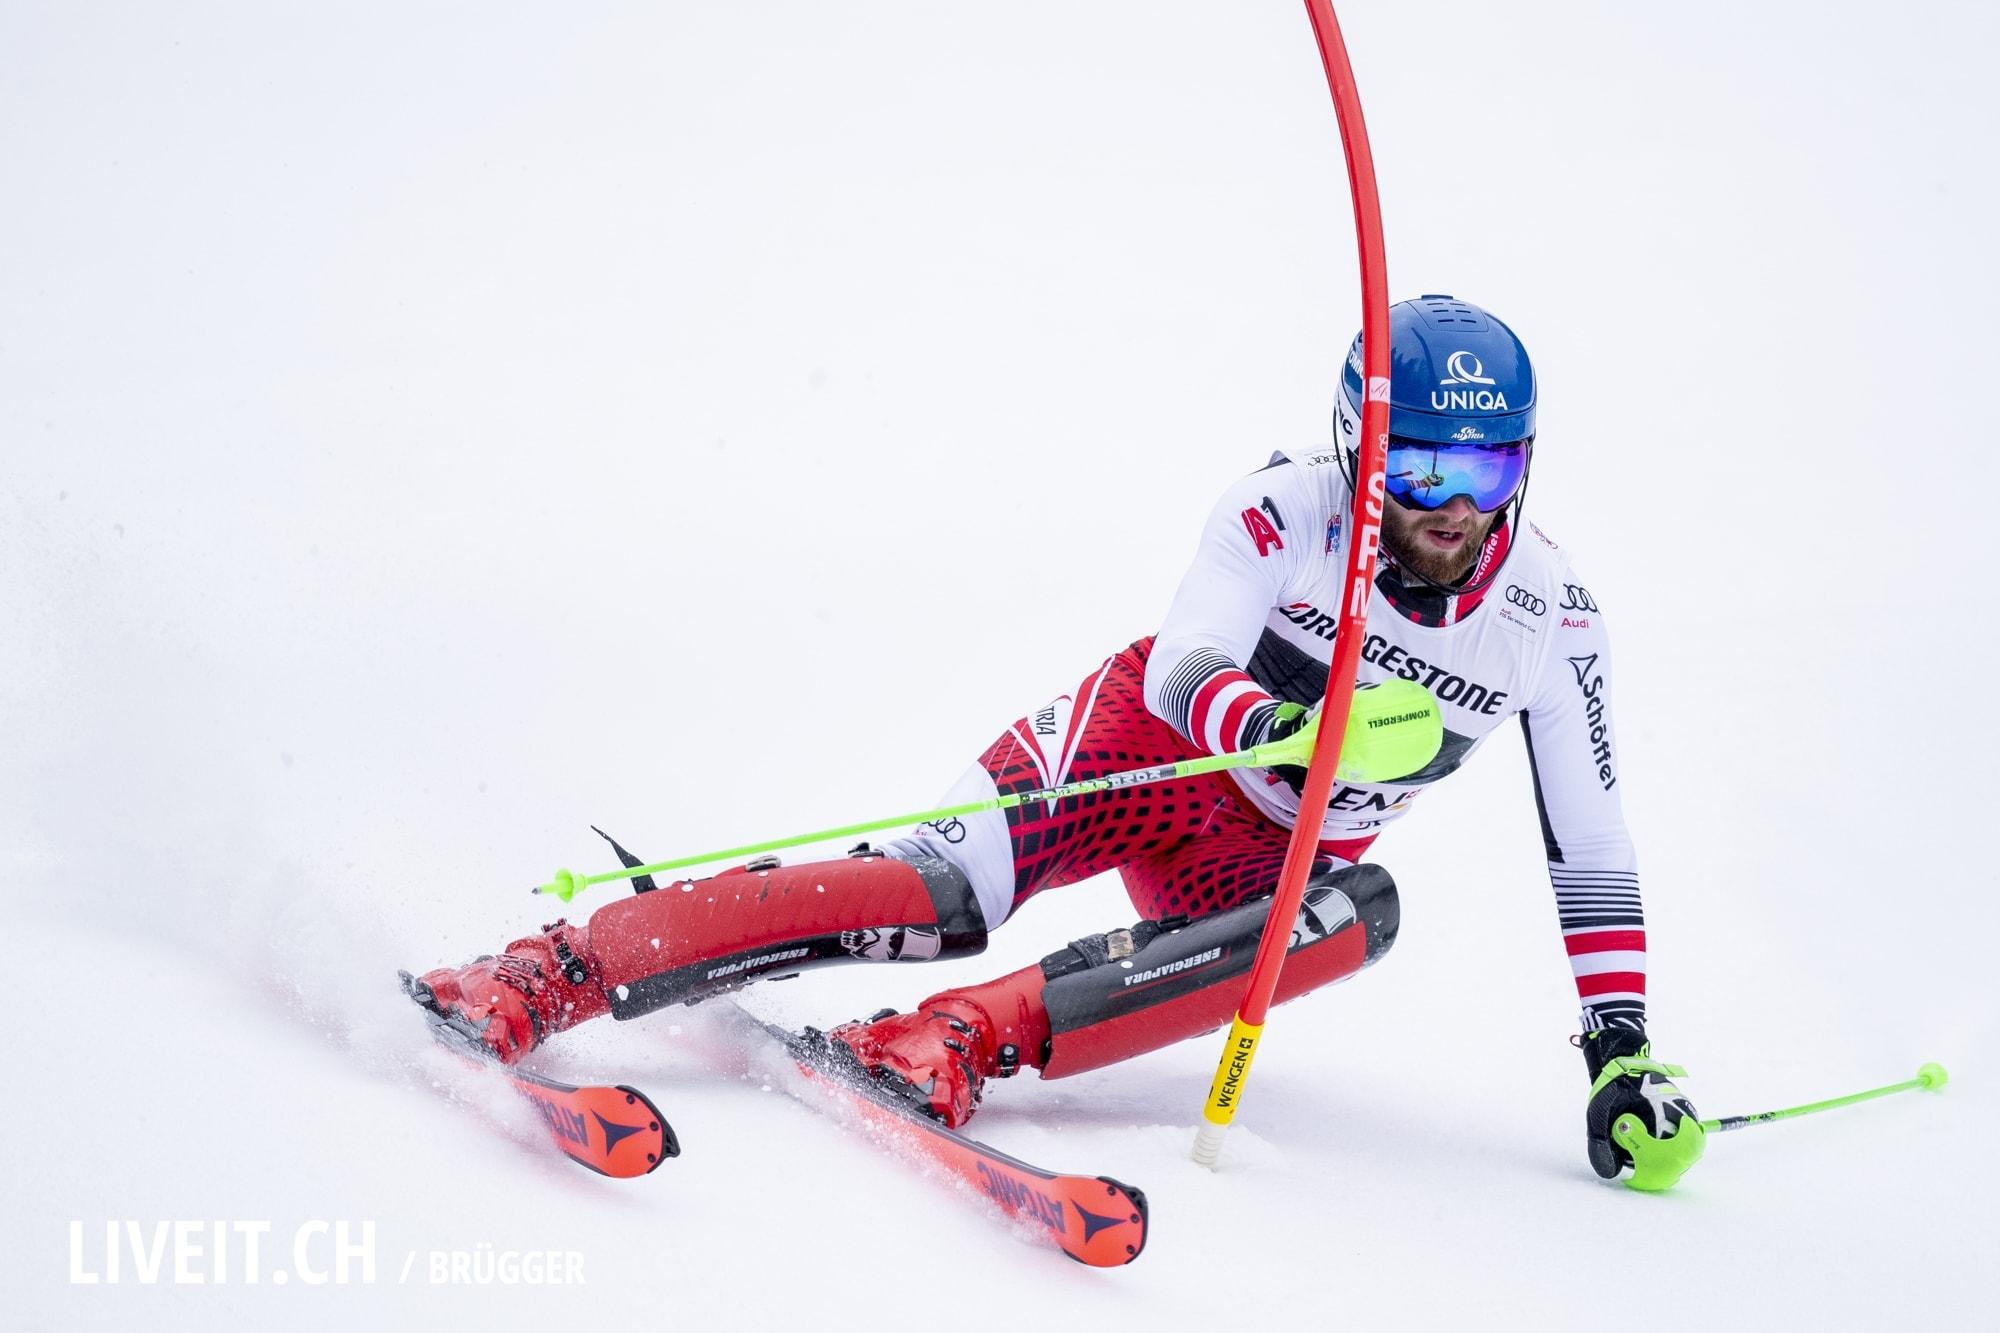 Marco Schwarz (AUT) fotografiert am Freitag, 18. Januar 2019 am Lauberhornrennen in der Disziplin: Slalom Alpine Kombination. (Fotografiert von Dominic Bruegger liveit.ch)